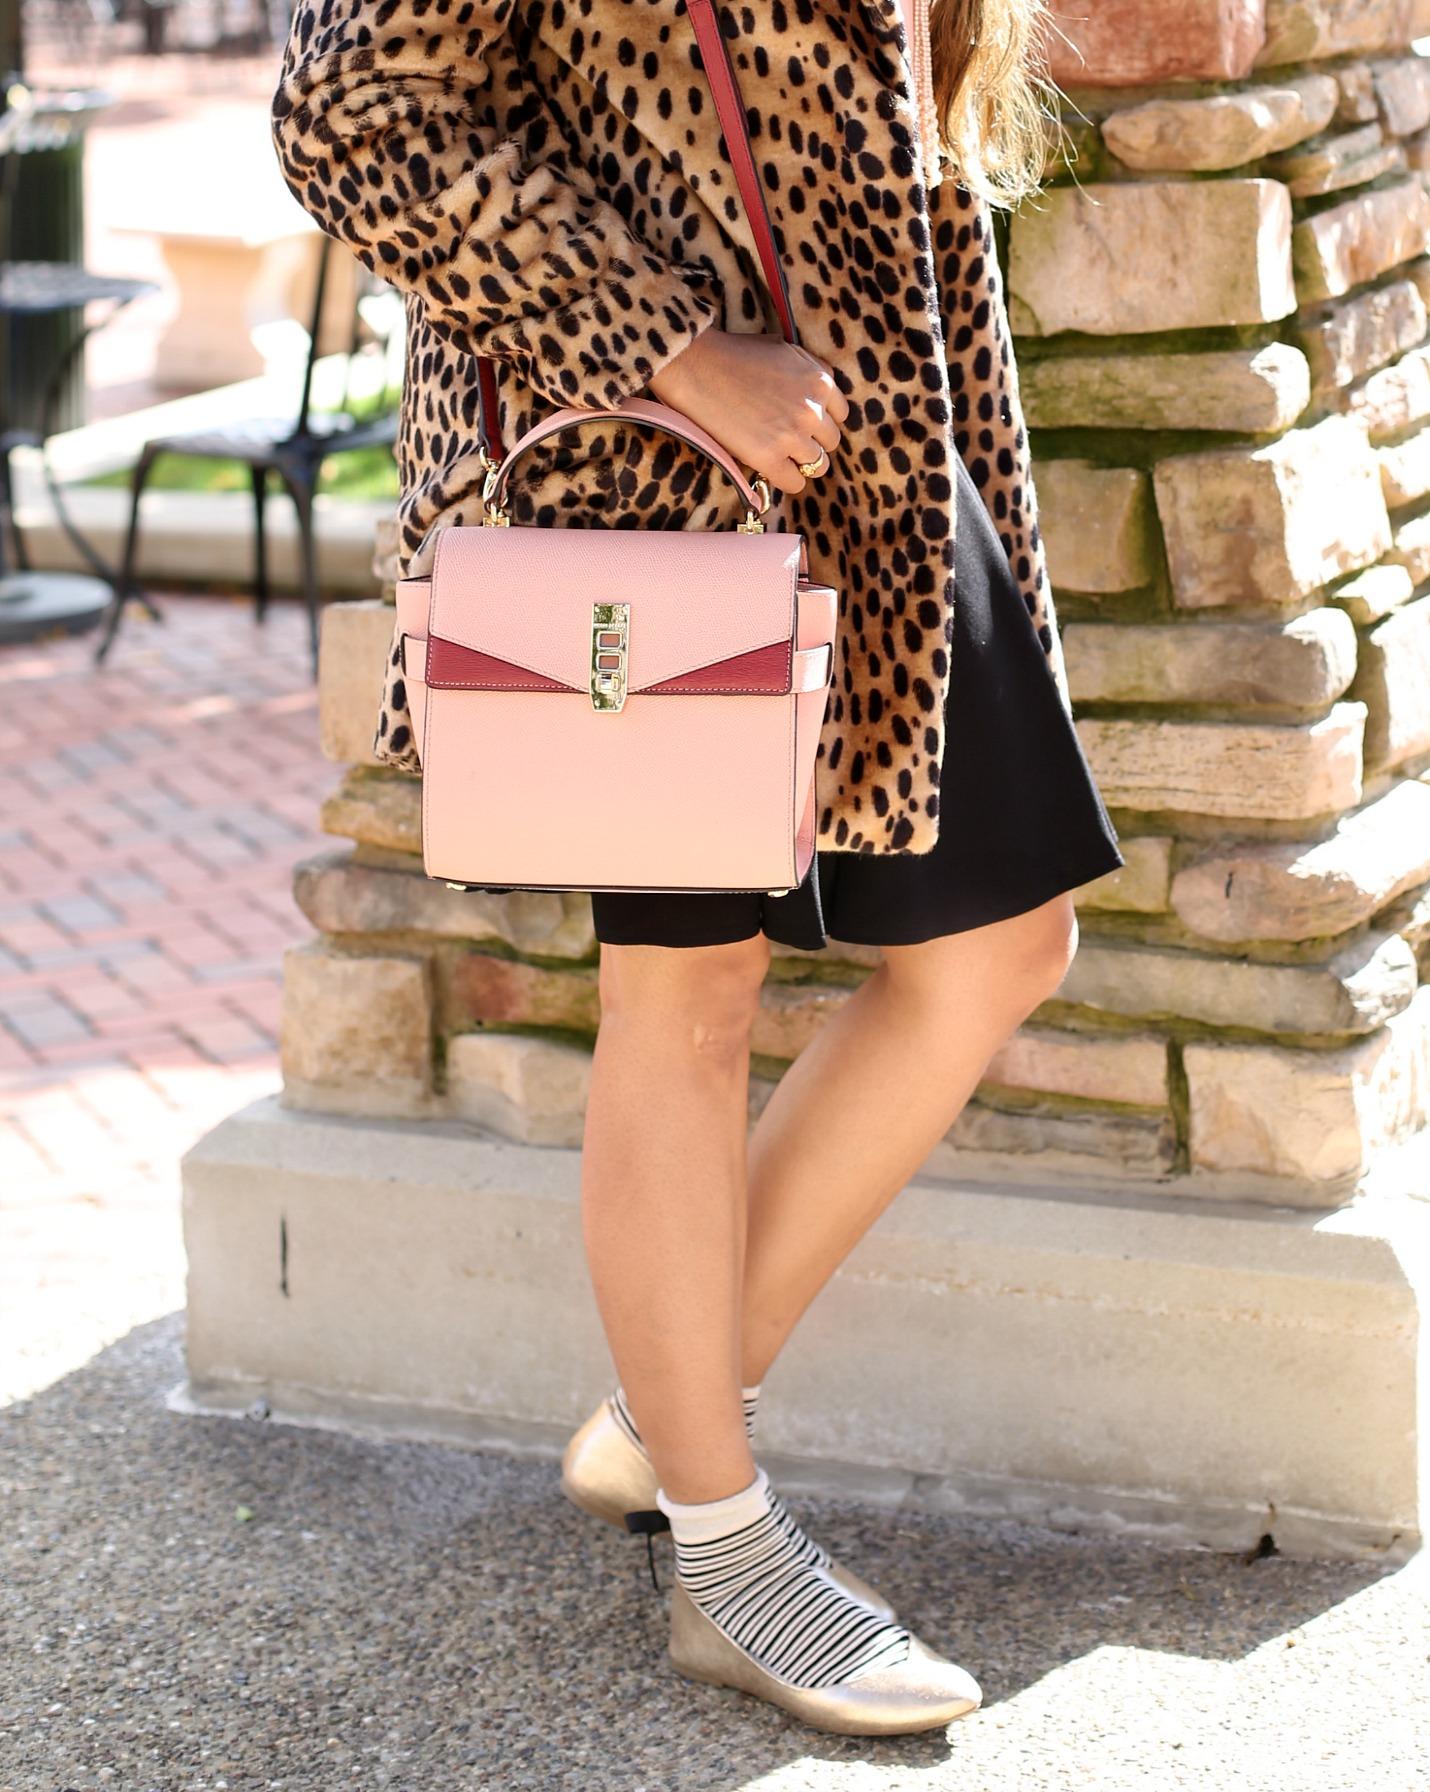 henri-bendel-uptown-mini-blocked-satchel-pink-1